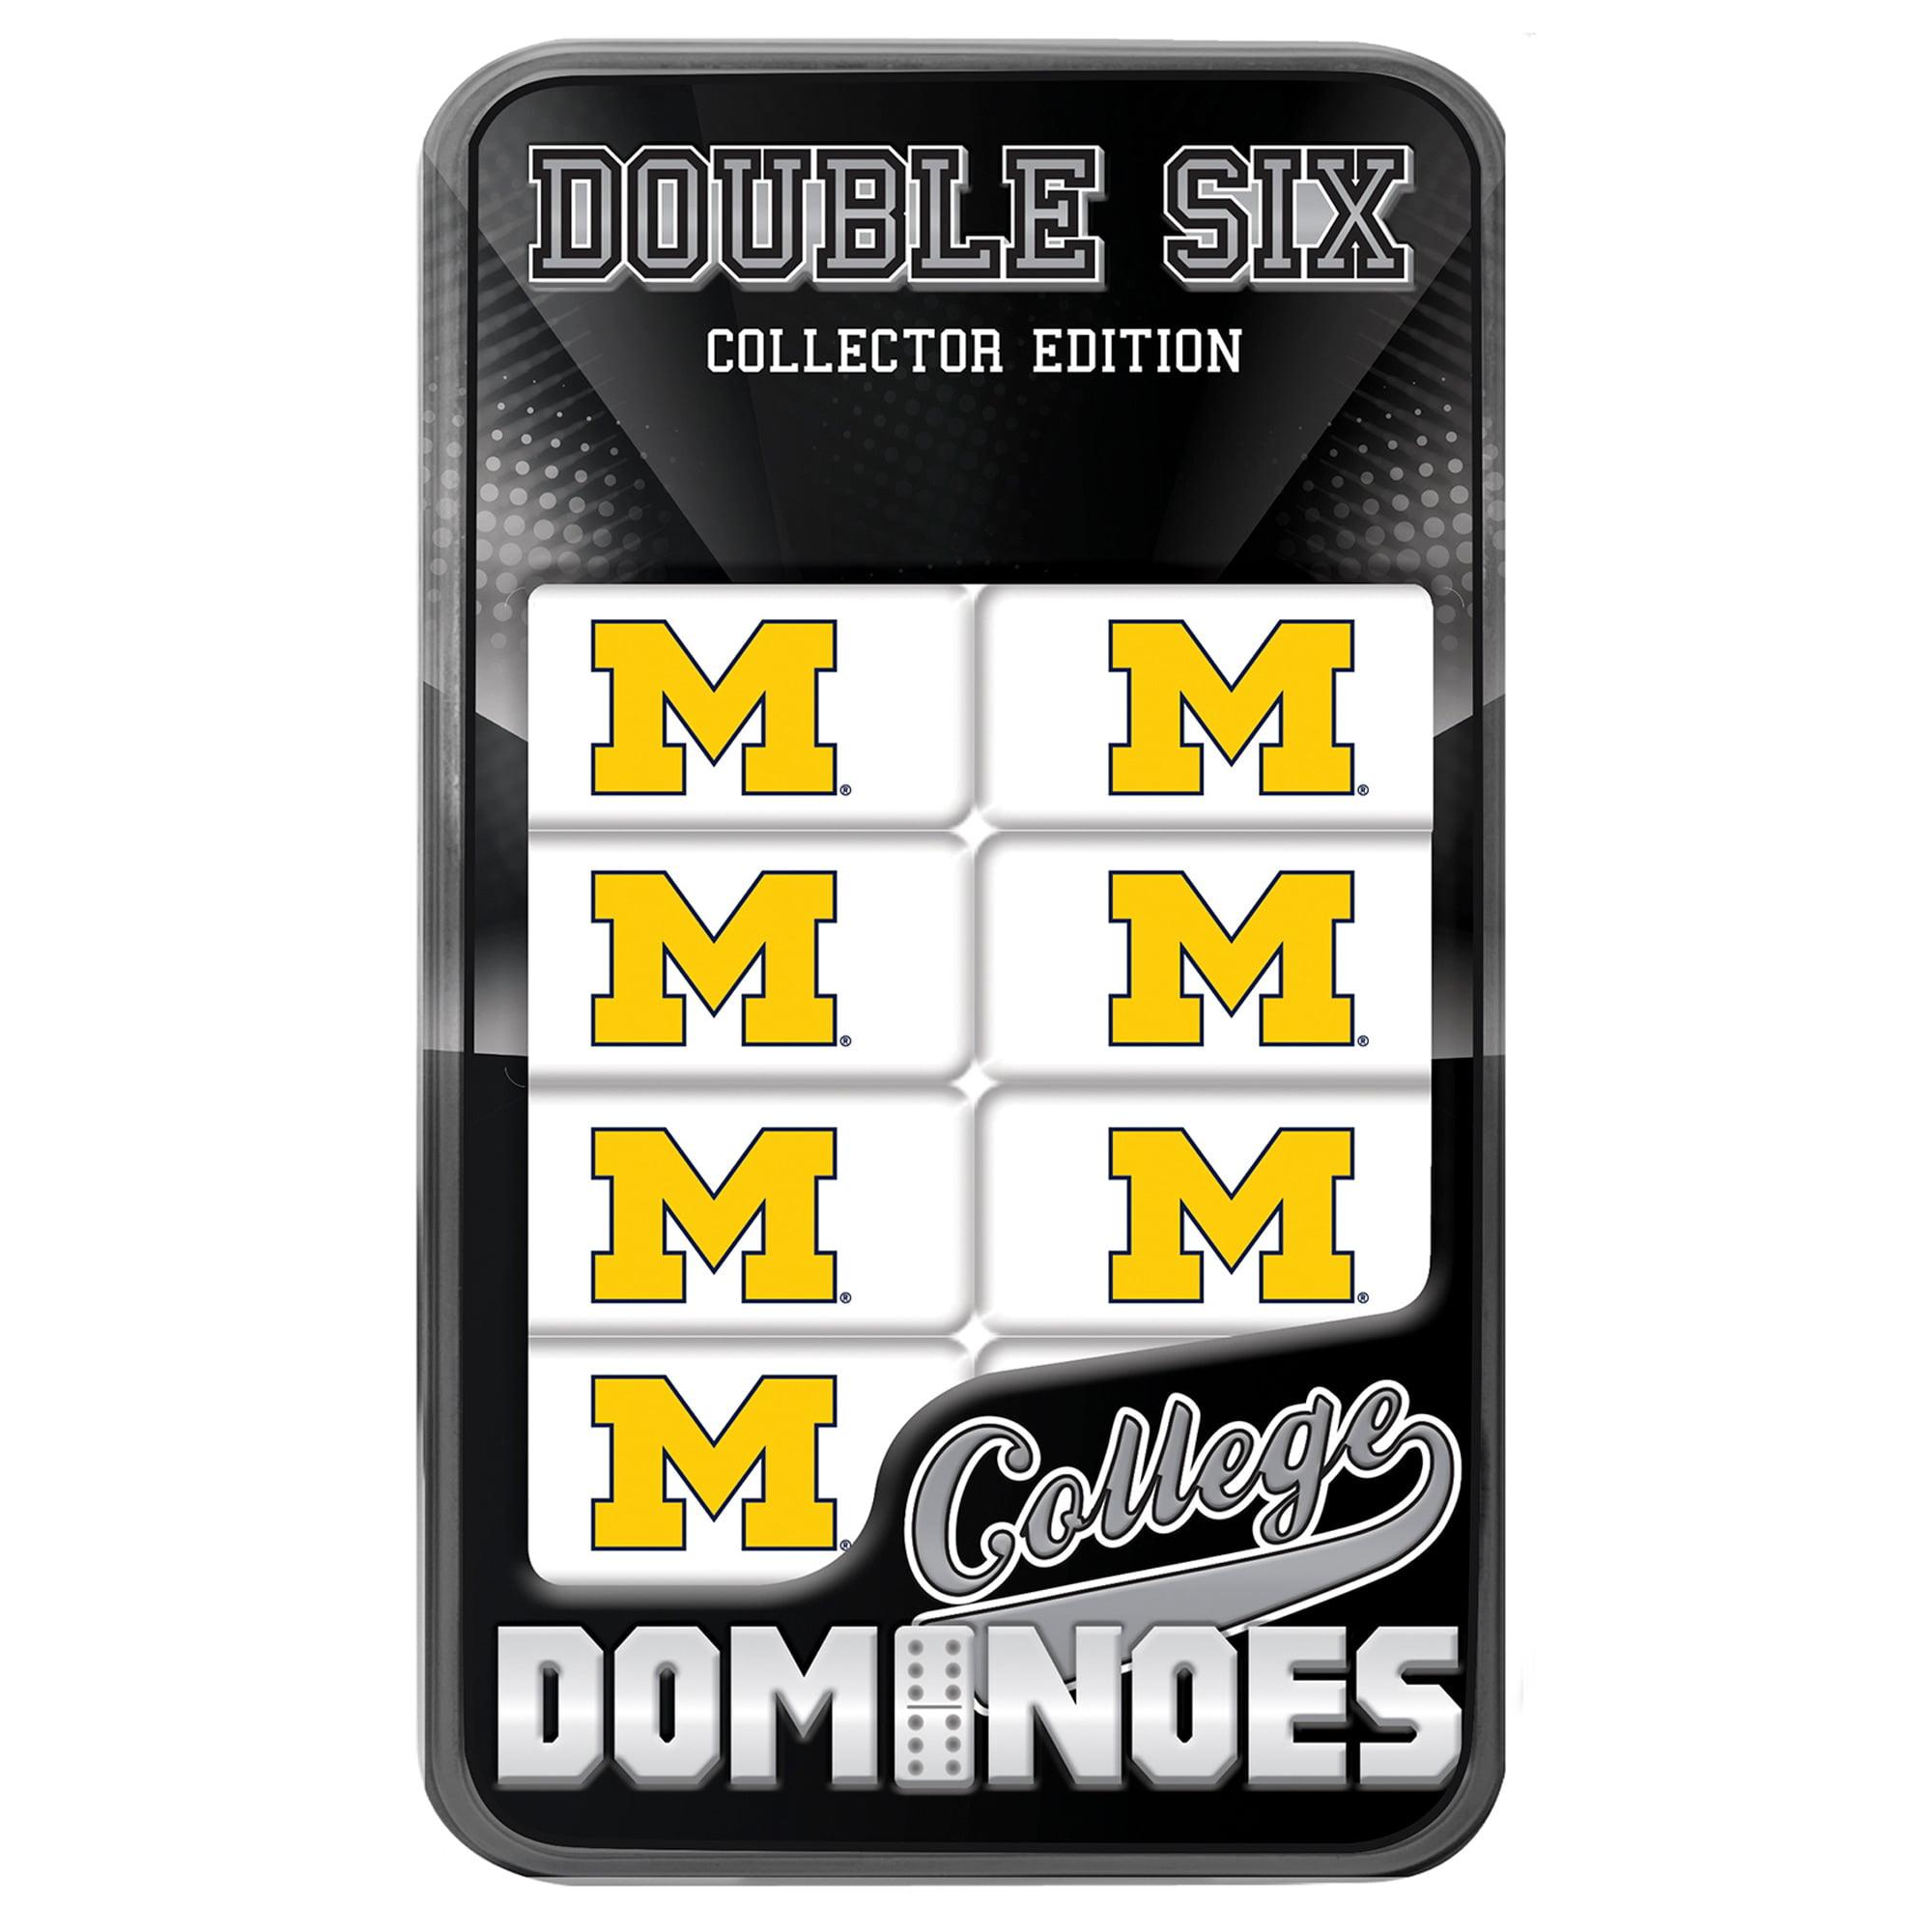 NCAA Michigan Wolverines Domino Set in Metal Gift Tin